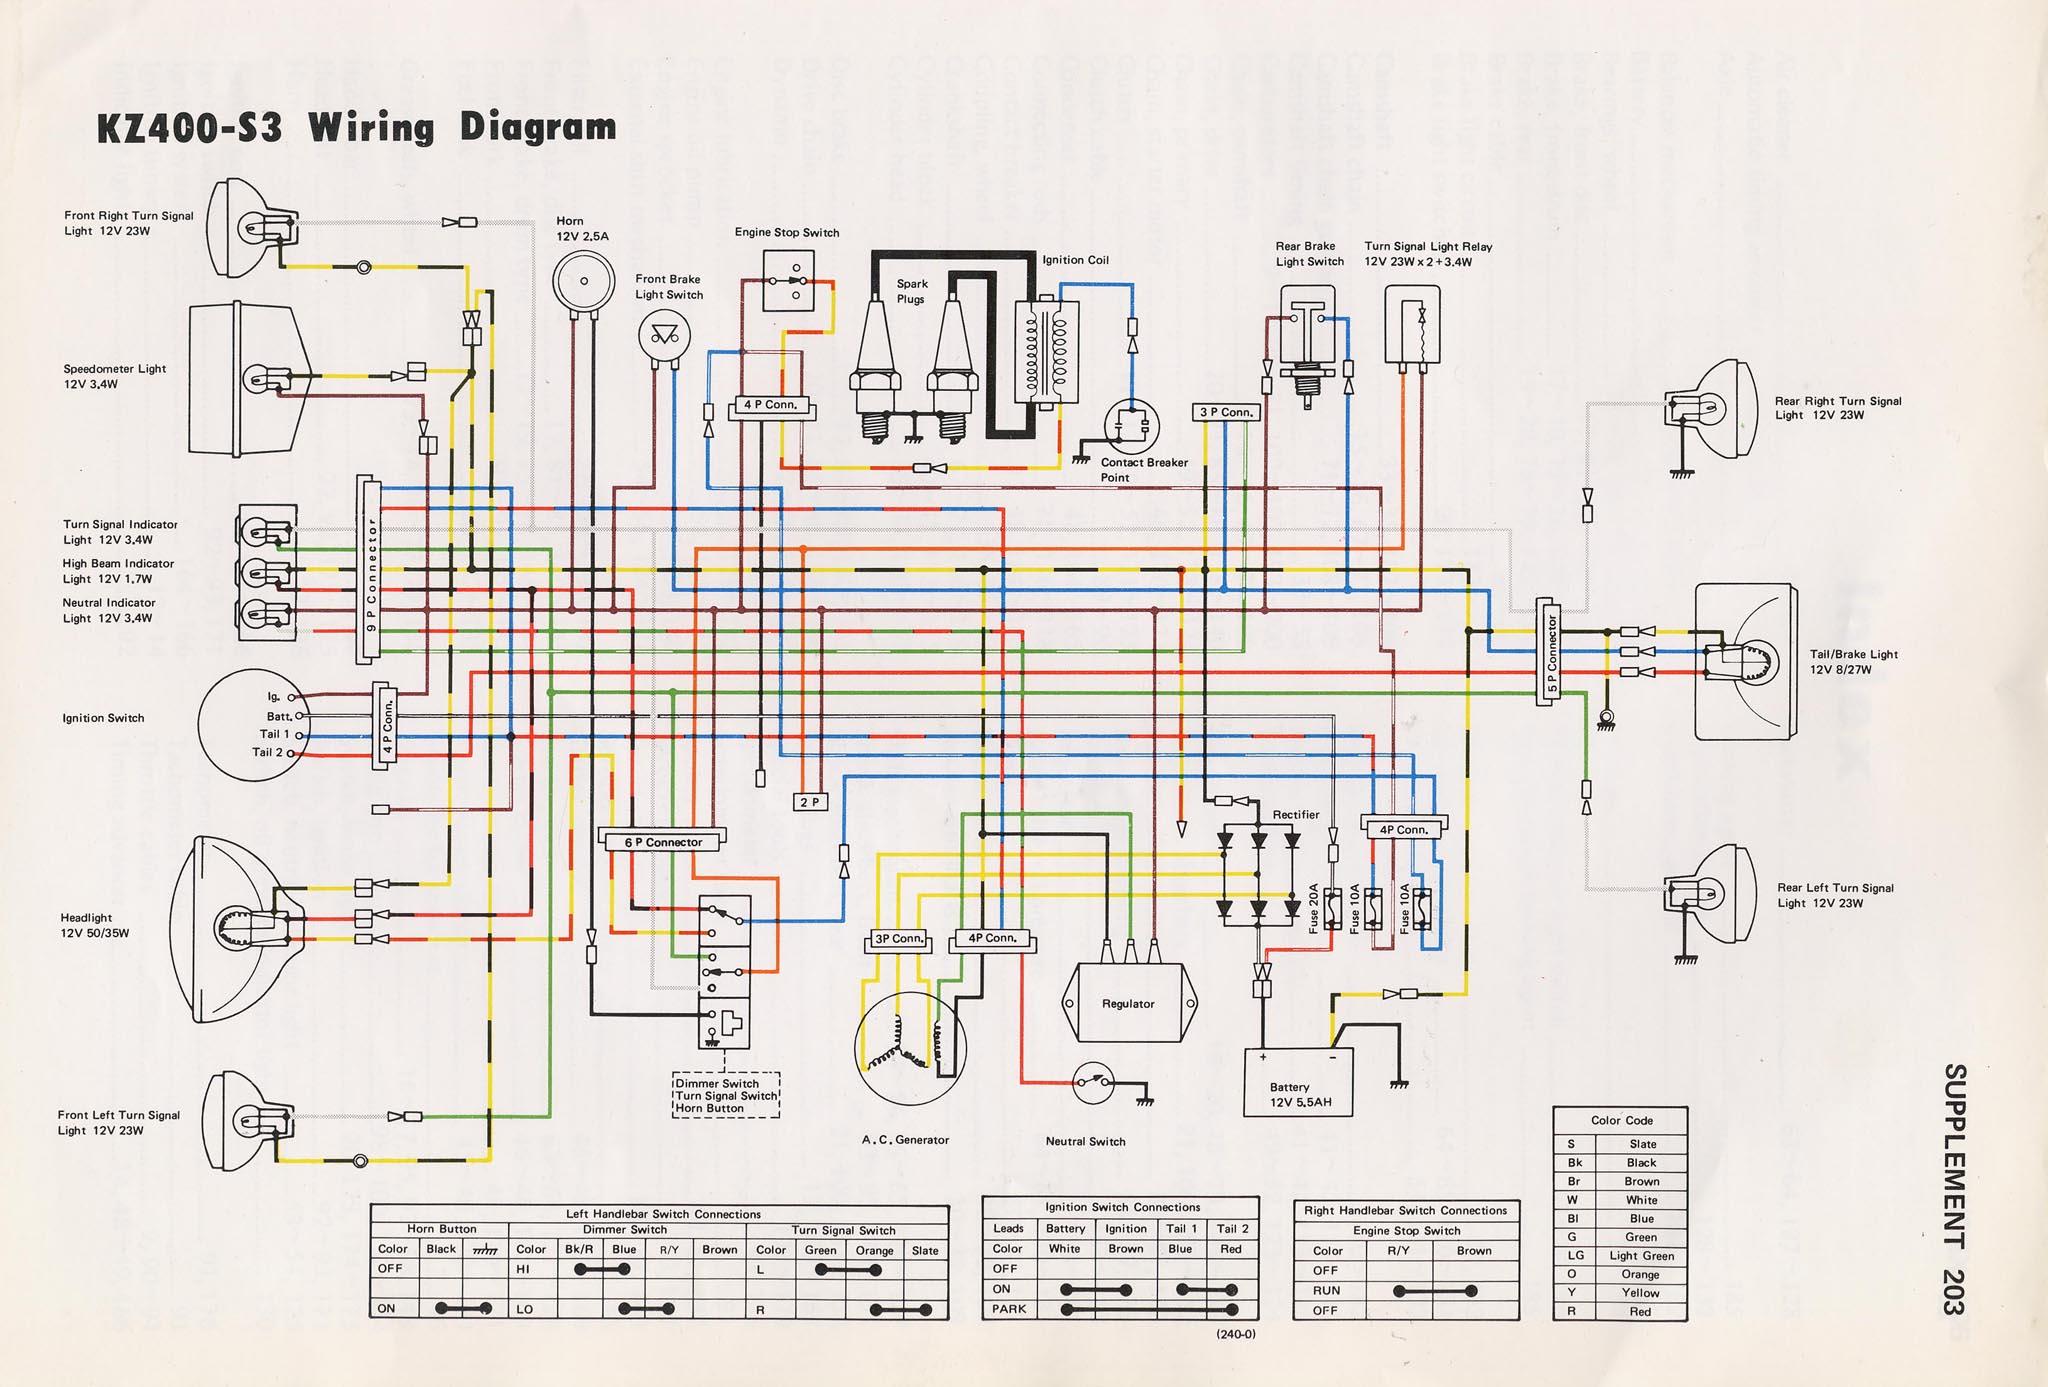 Peachy Kz440 Wiring Diagram Wiring Diagram Wiring Cloud Hisonuggs Outletorg